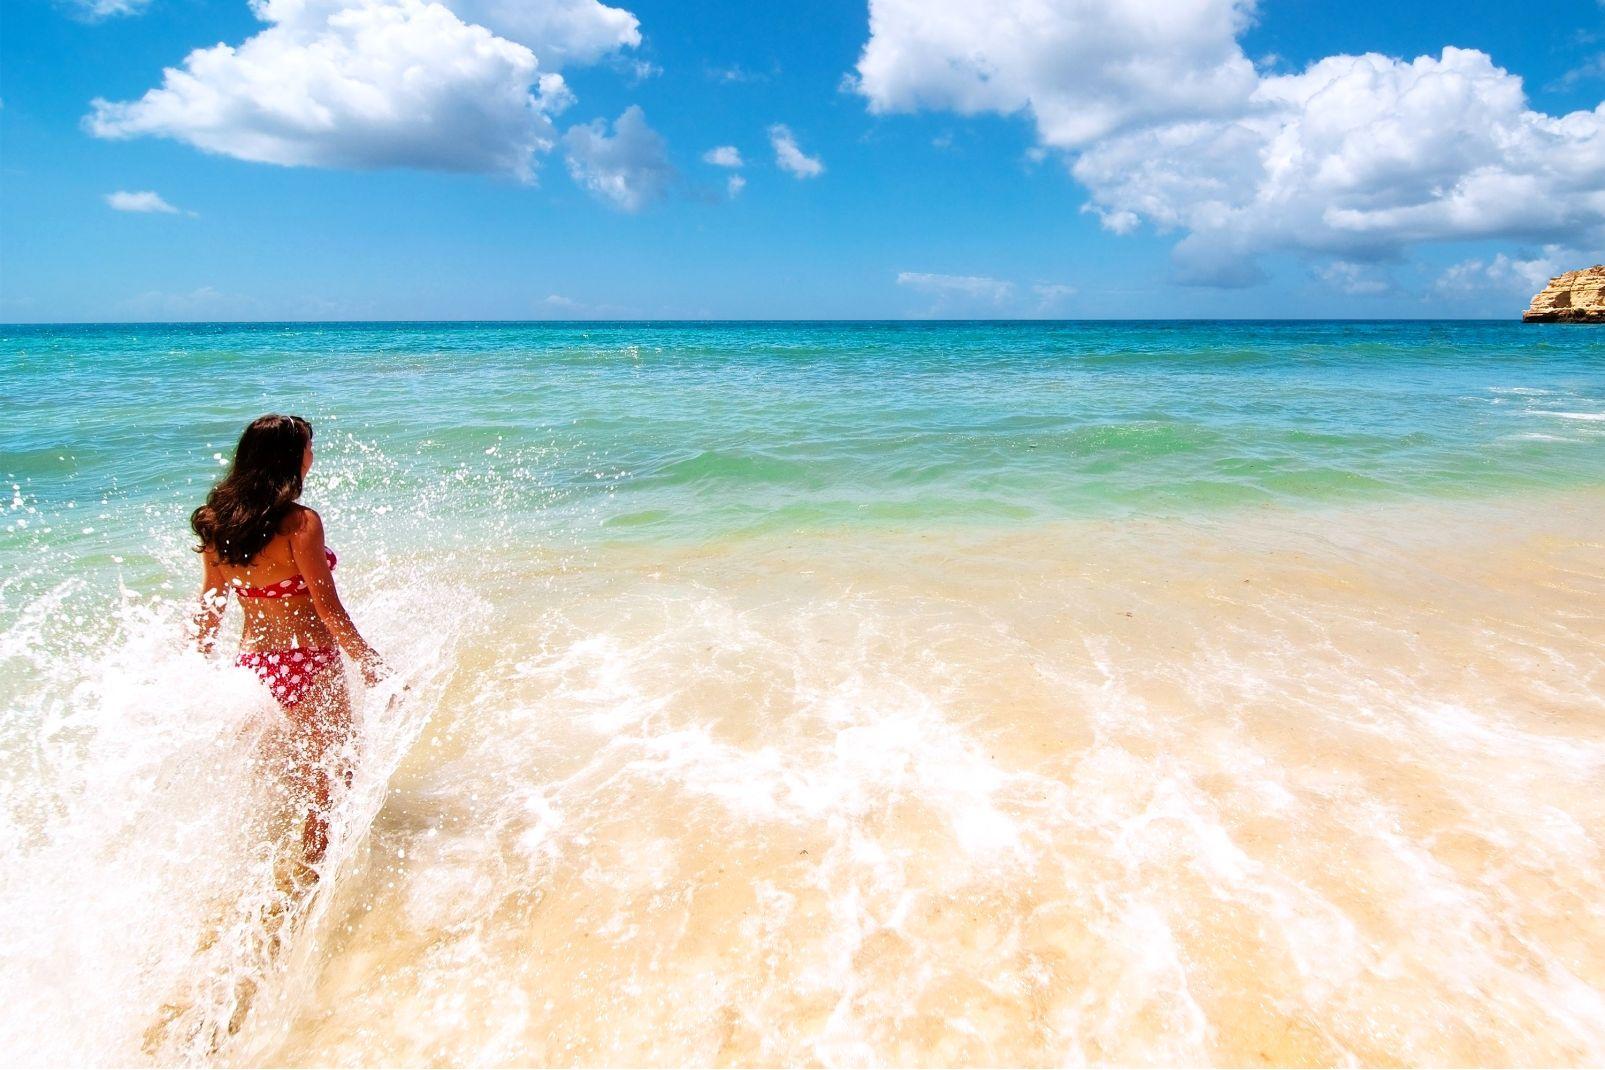 Liban, moyen-orient, méditerranée, montagne, femme, vacances, baignade, nageuse